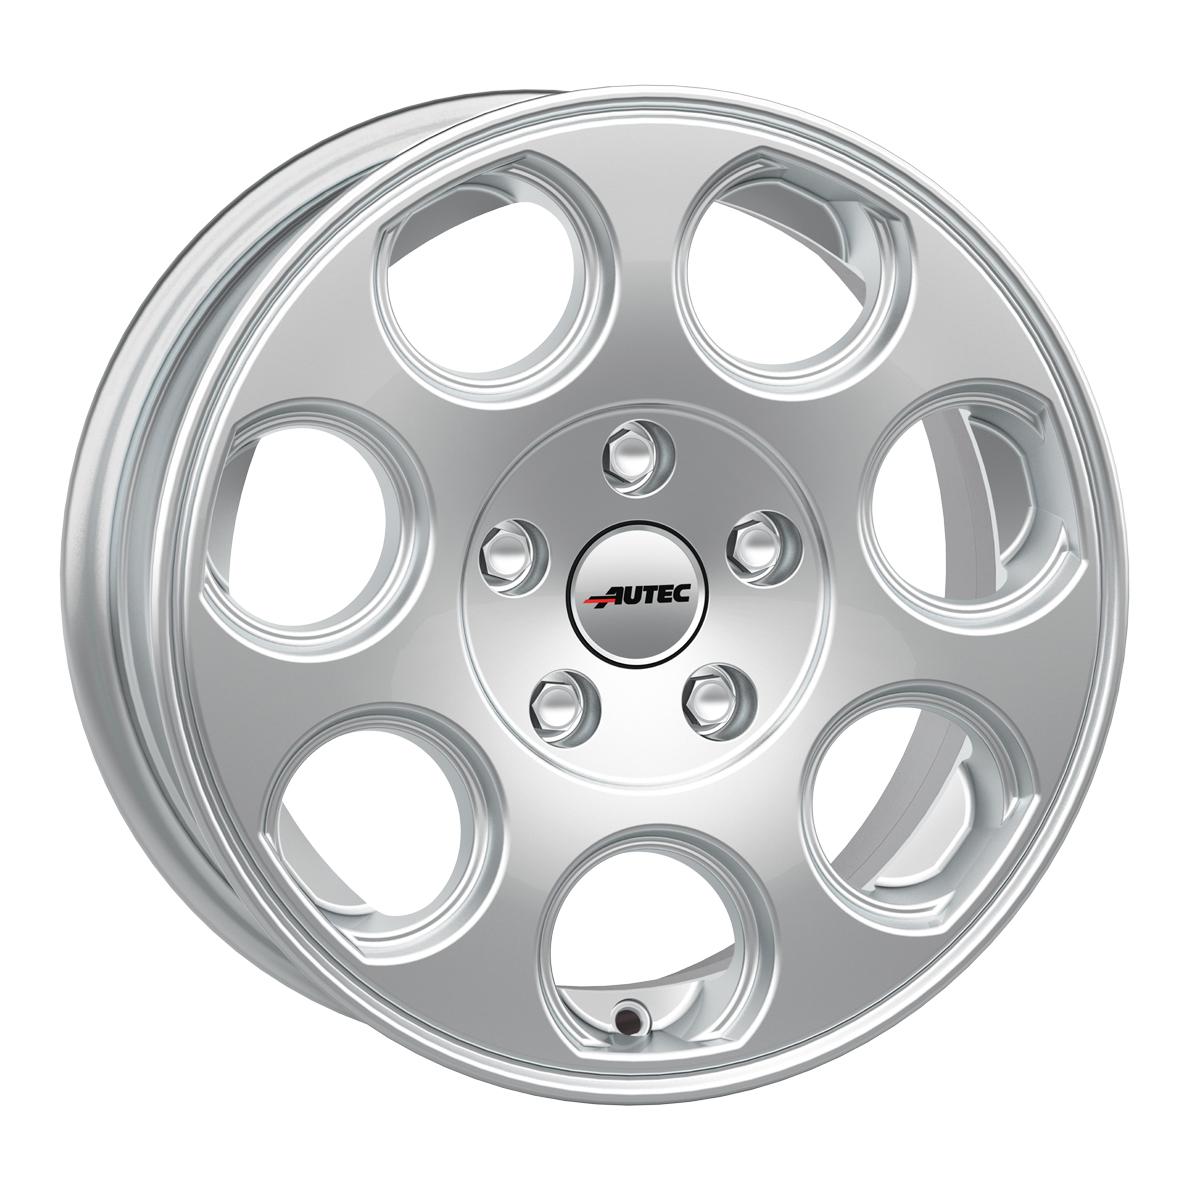 AUTEC Yuna hliníkové disky 6x14 4x100 ET30 Brilliant Silver